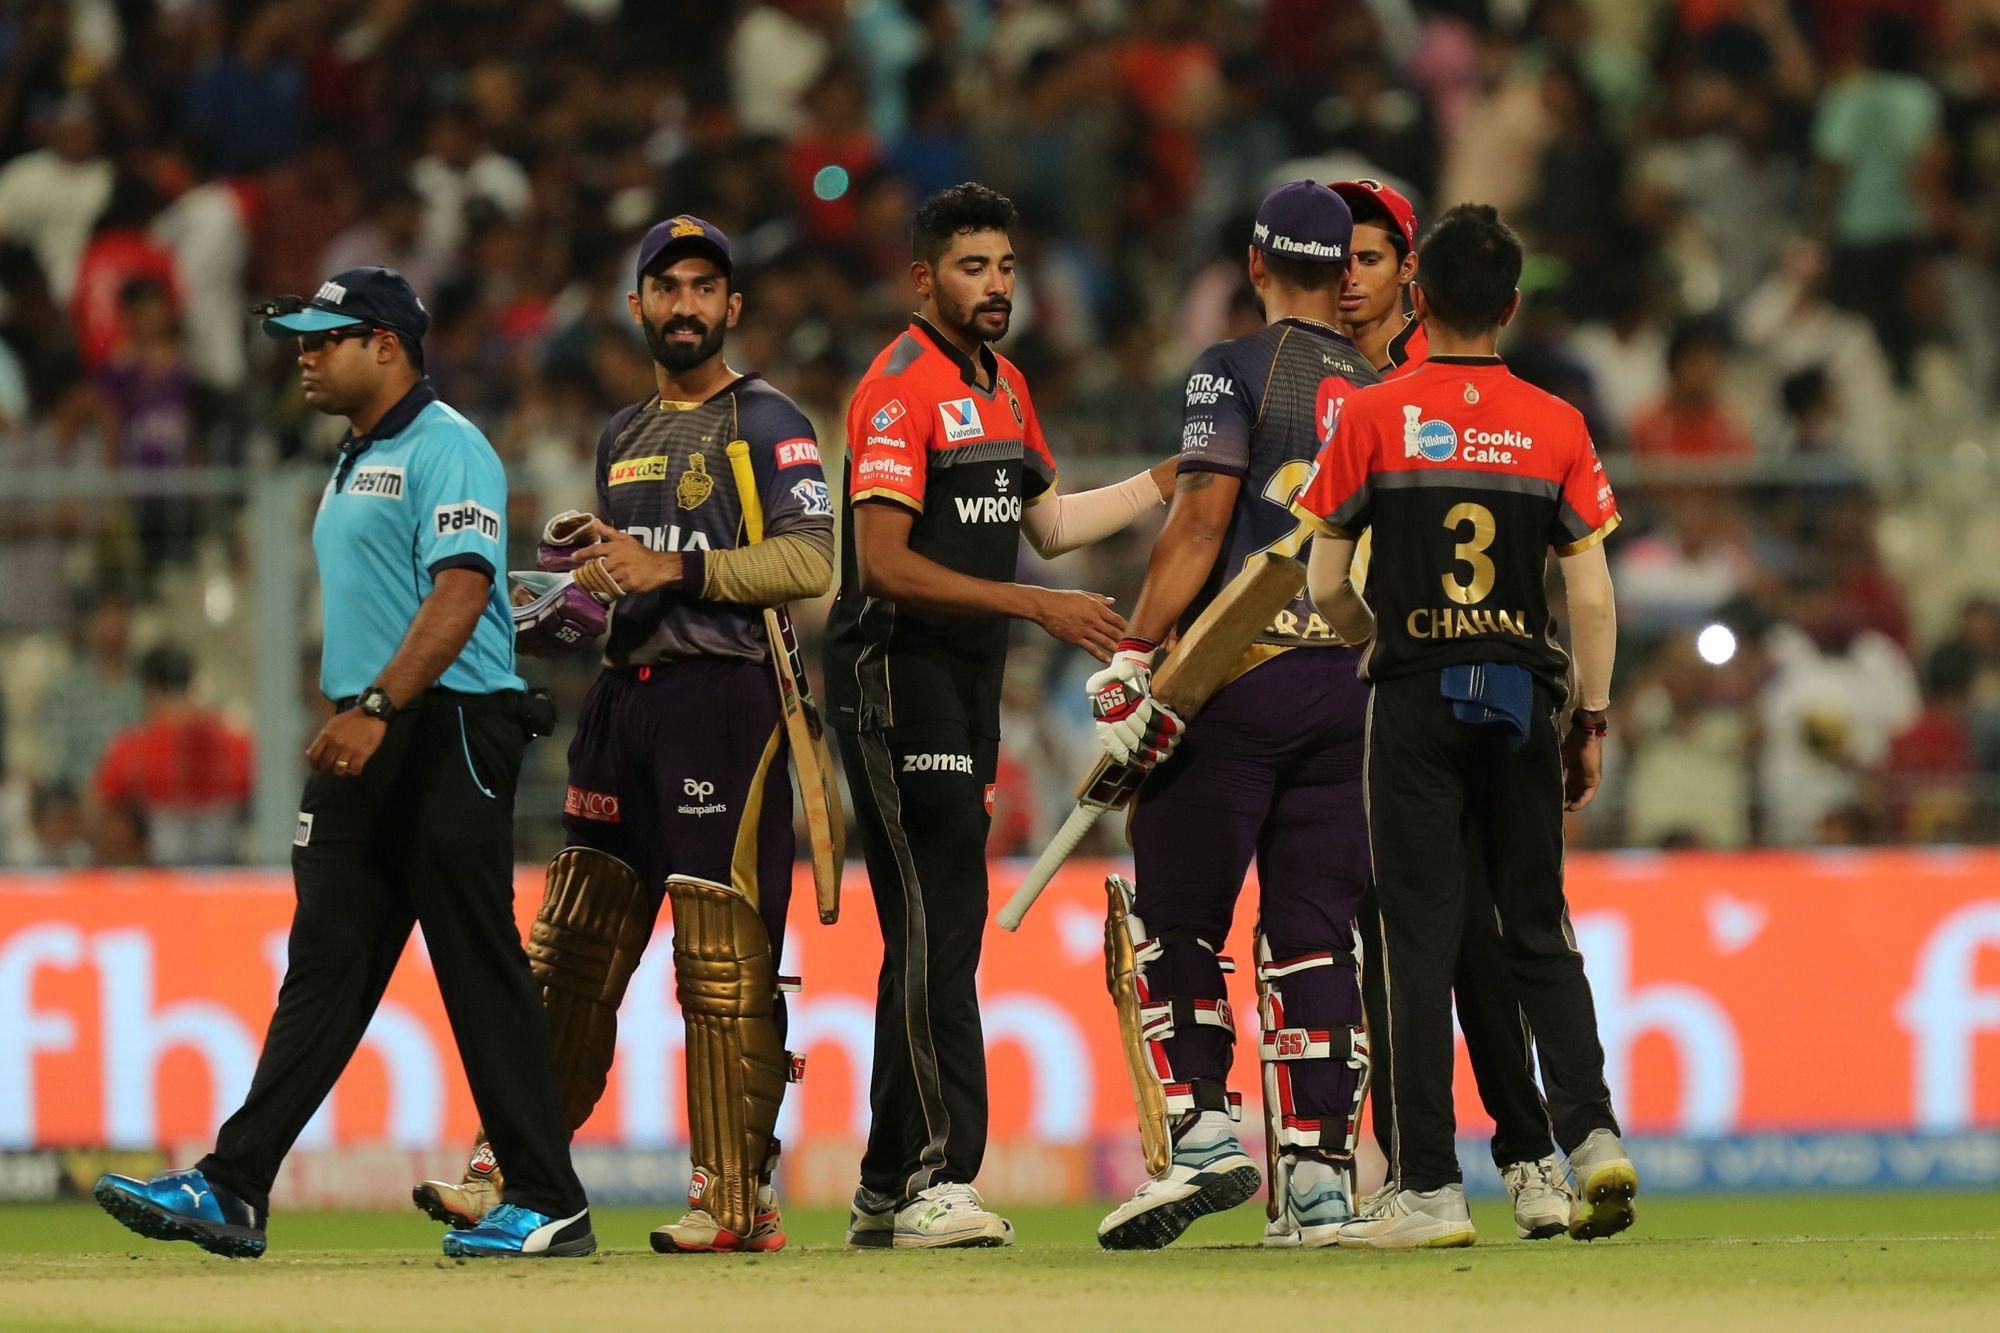 IPL 2021; KKR vs RCB: সুনীল নারাইন তার দুর্দান্ত বোলিংয়ের জন্য প্রশংসিত হচ্ছে, অন্যদিকে বিরাট কোহলিকে জানাচ্ছে দুঃখের সাথে বিদায় 2